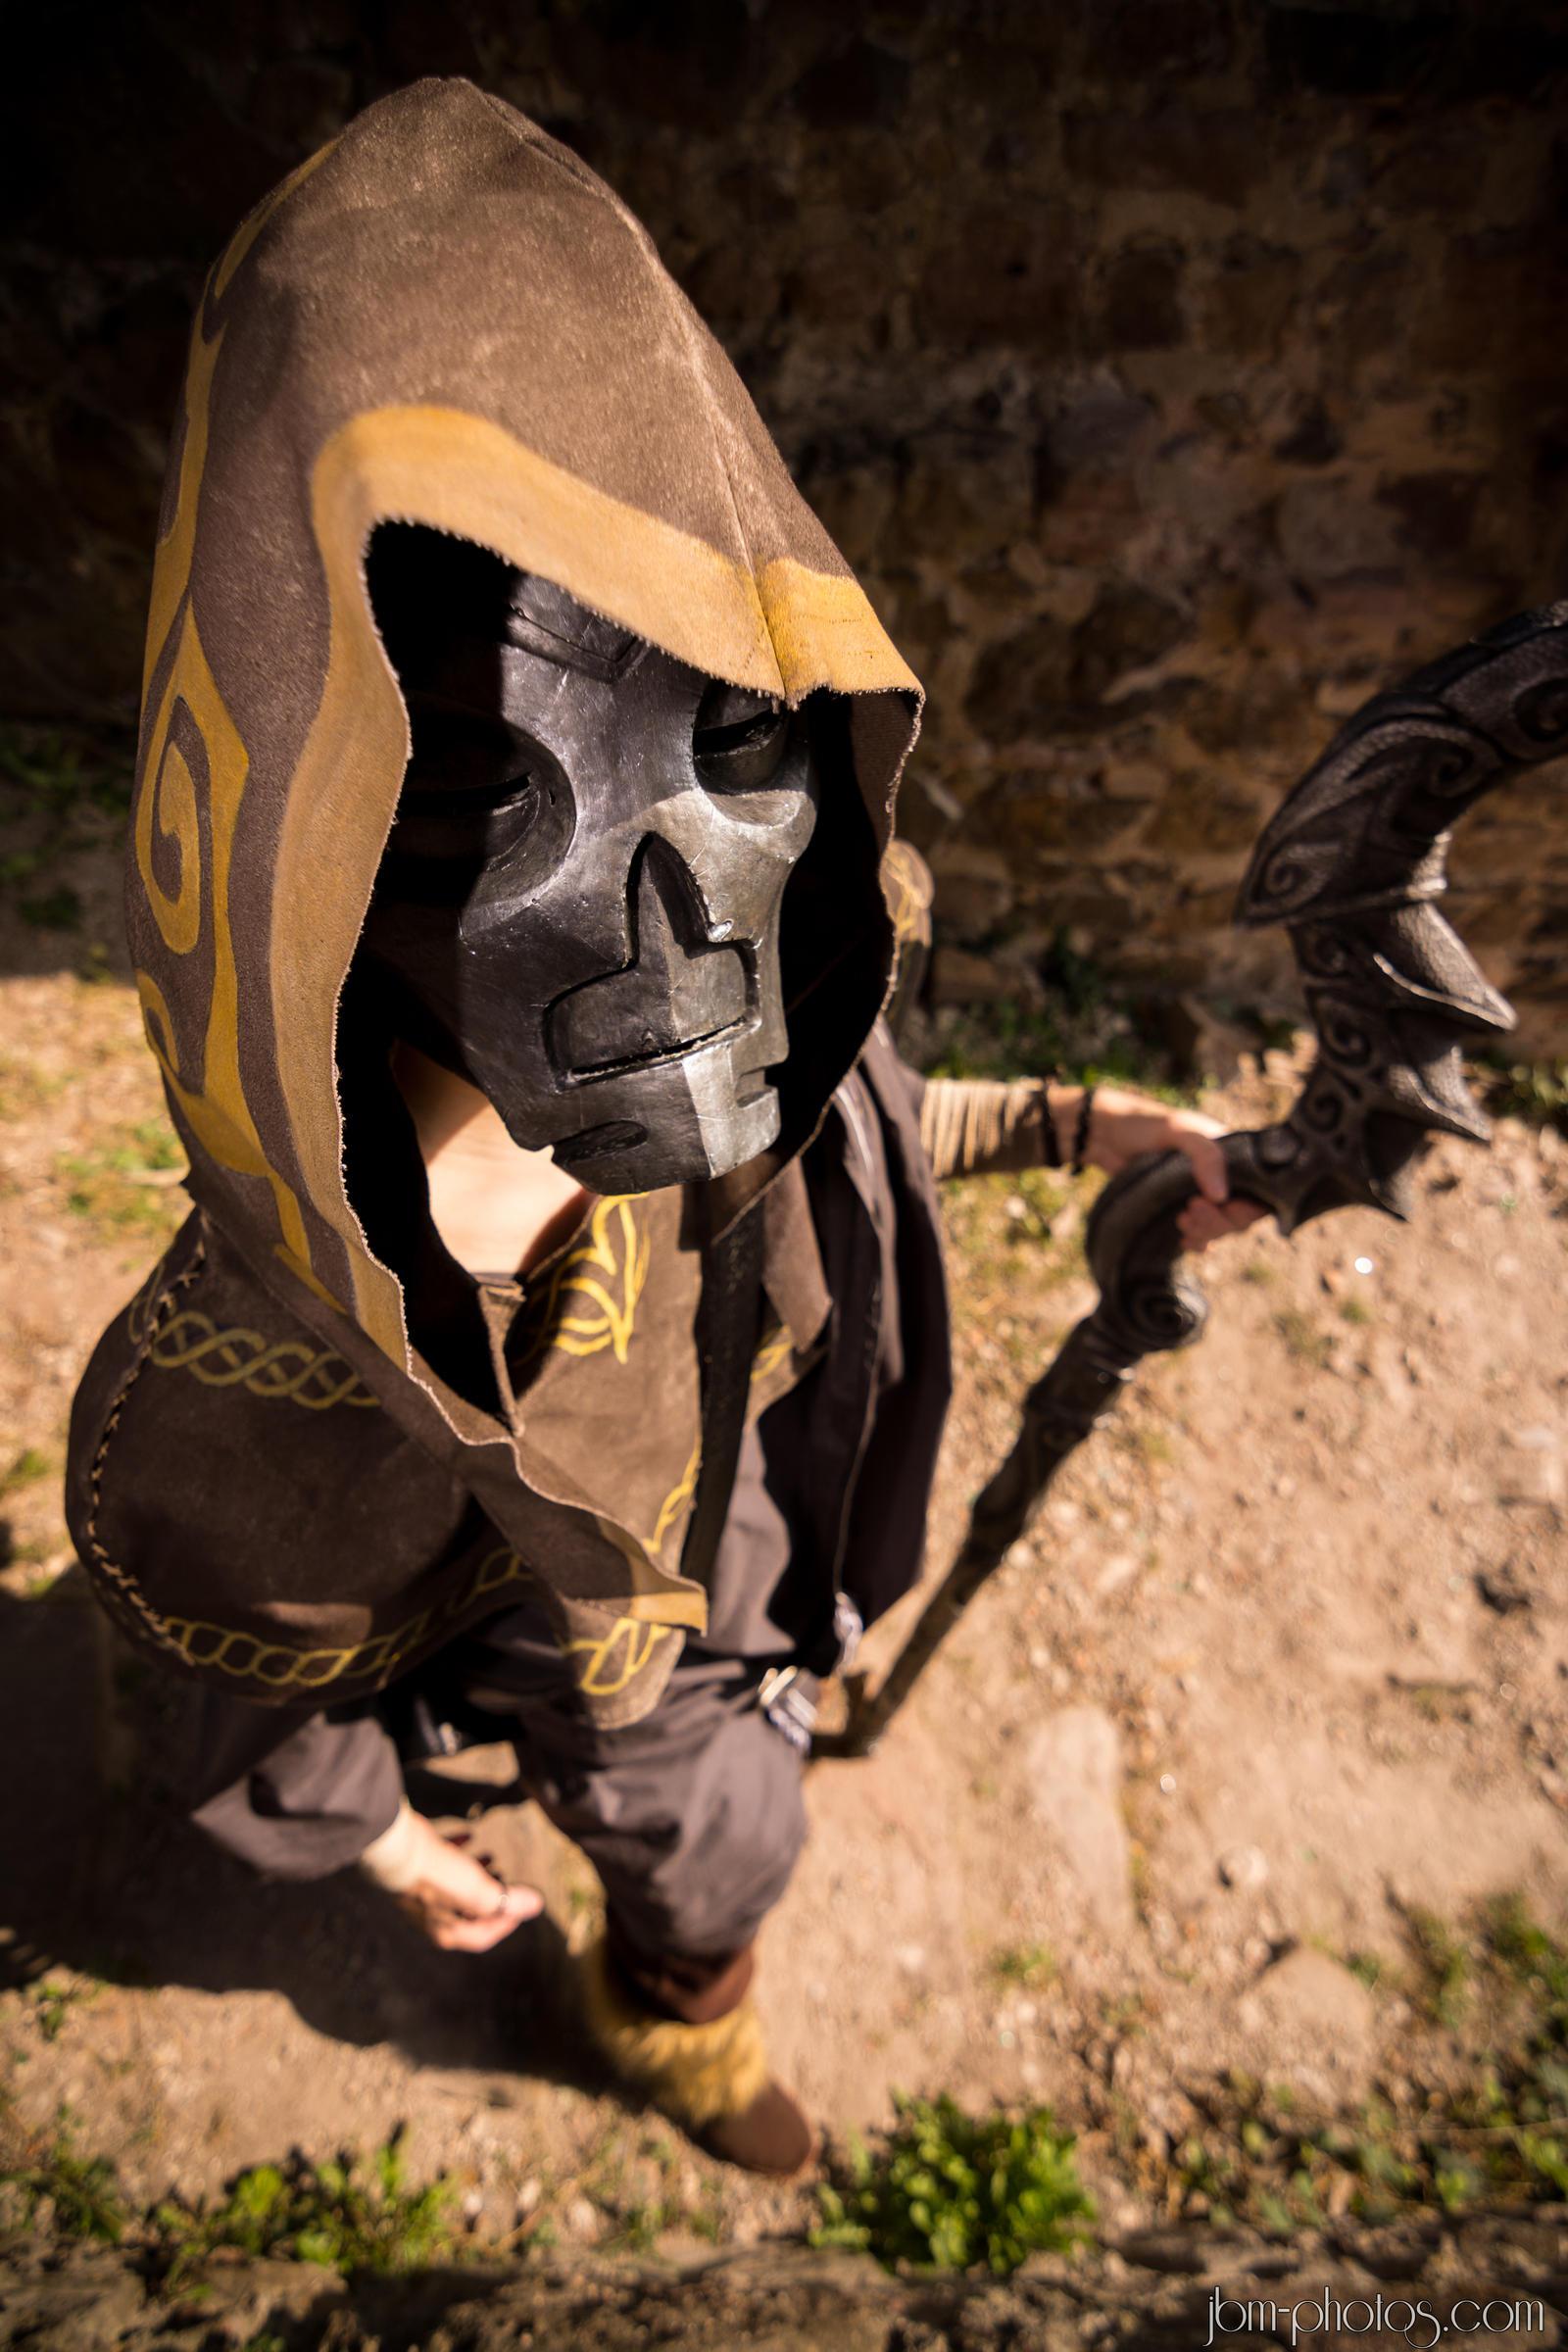 Skyrim Cosplay - Dragon Priest by BlackOwlStudio on DeviantArt